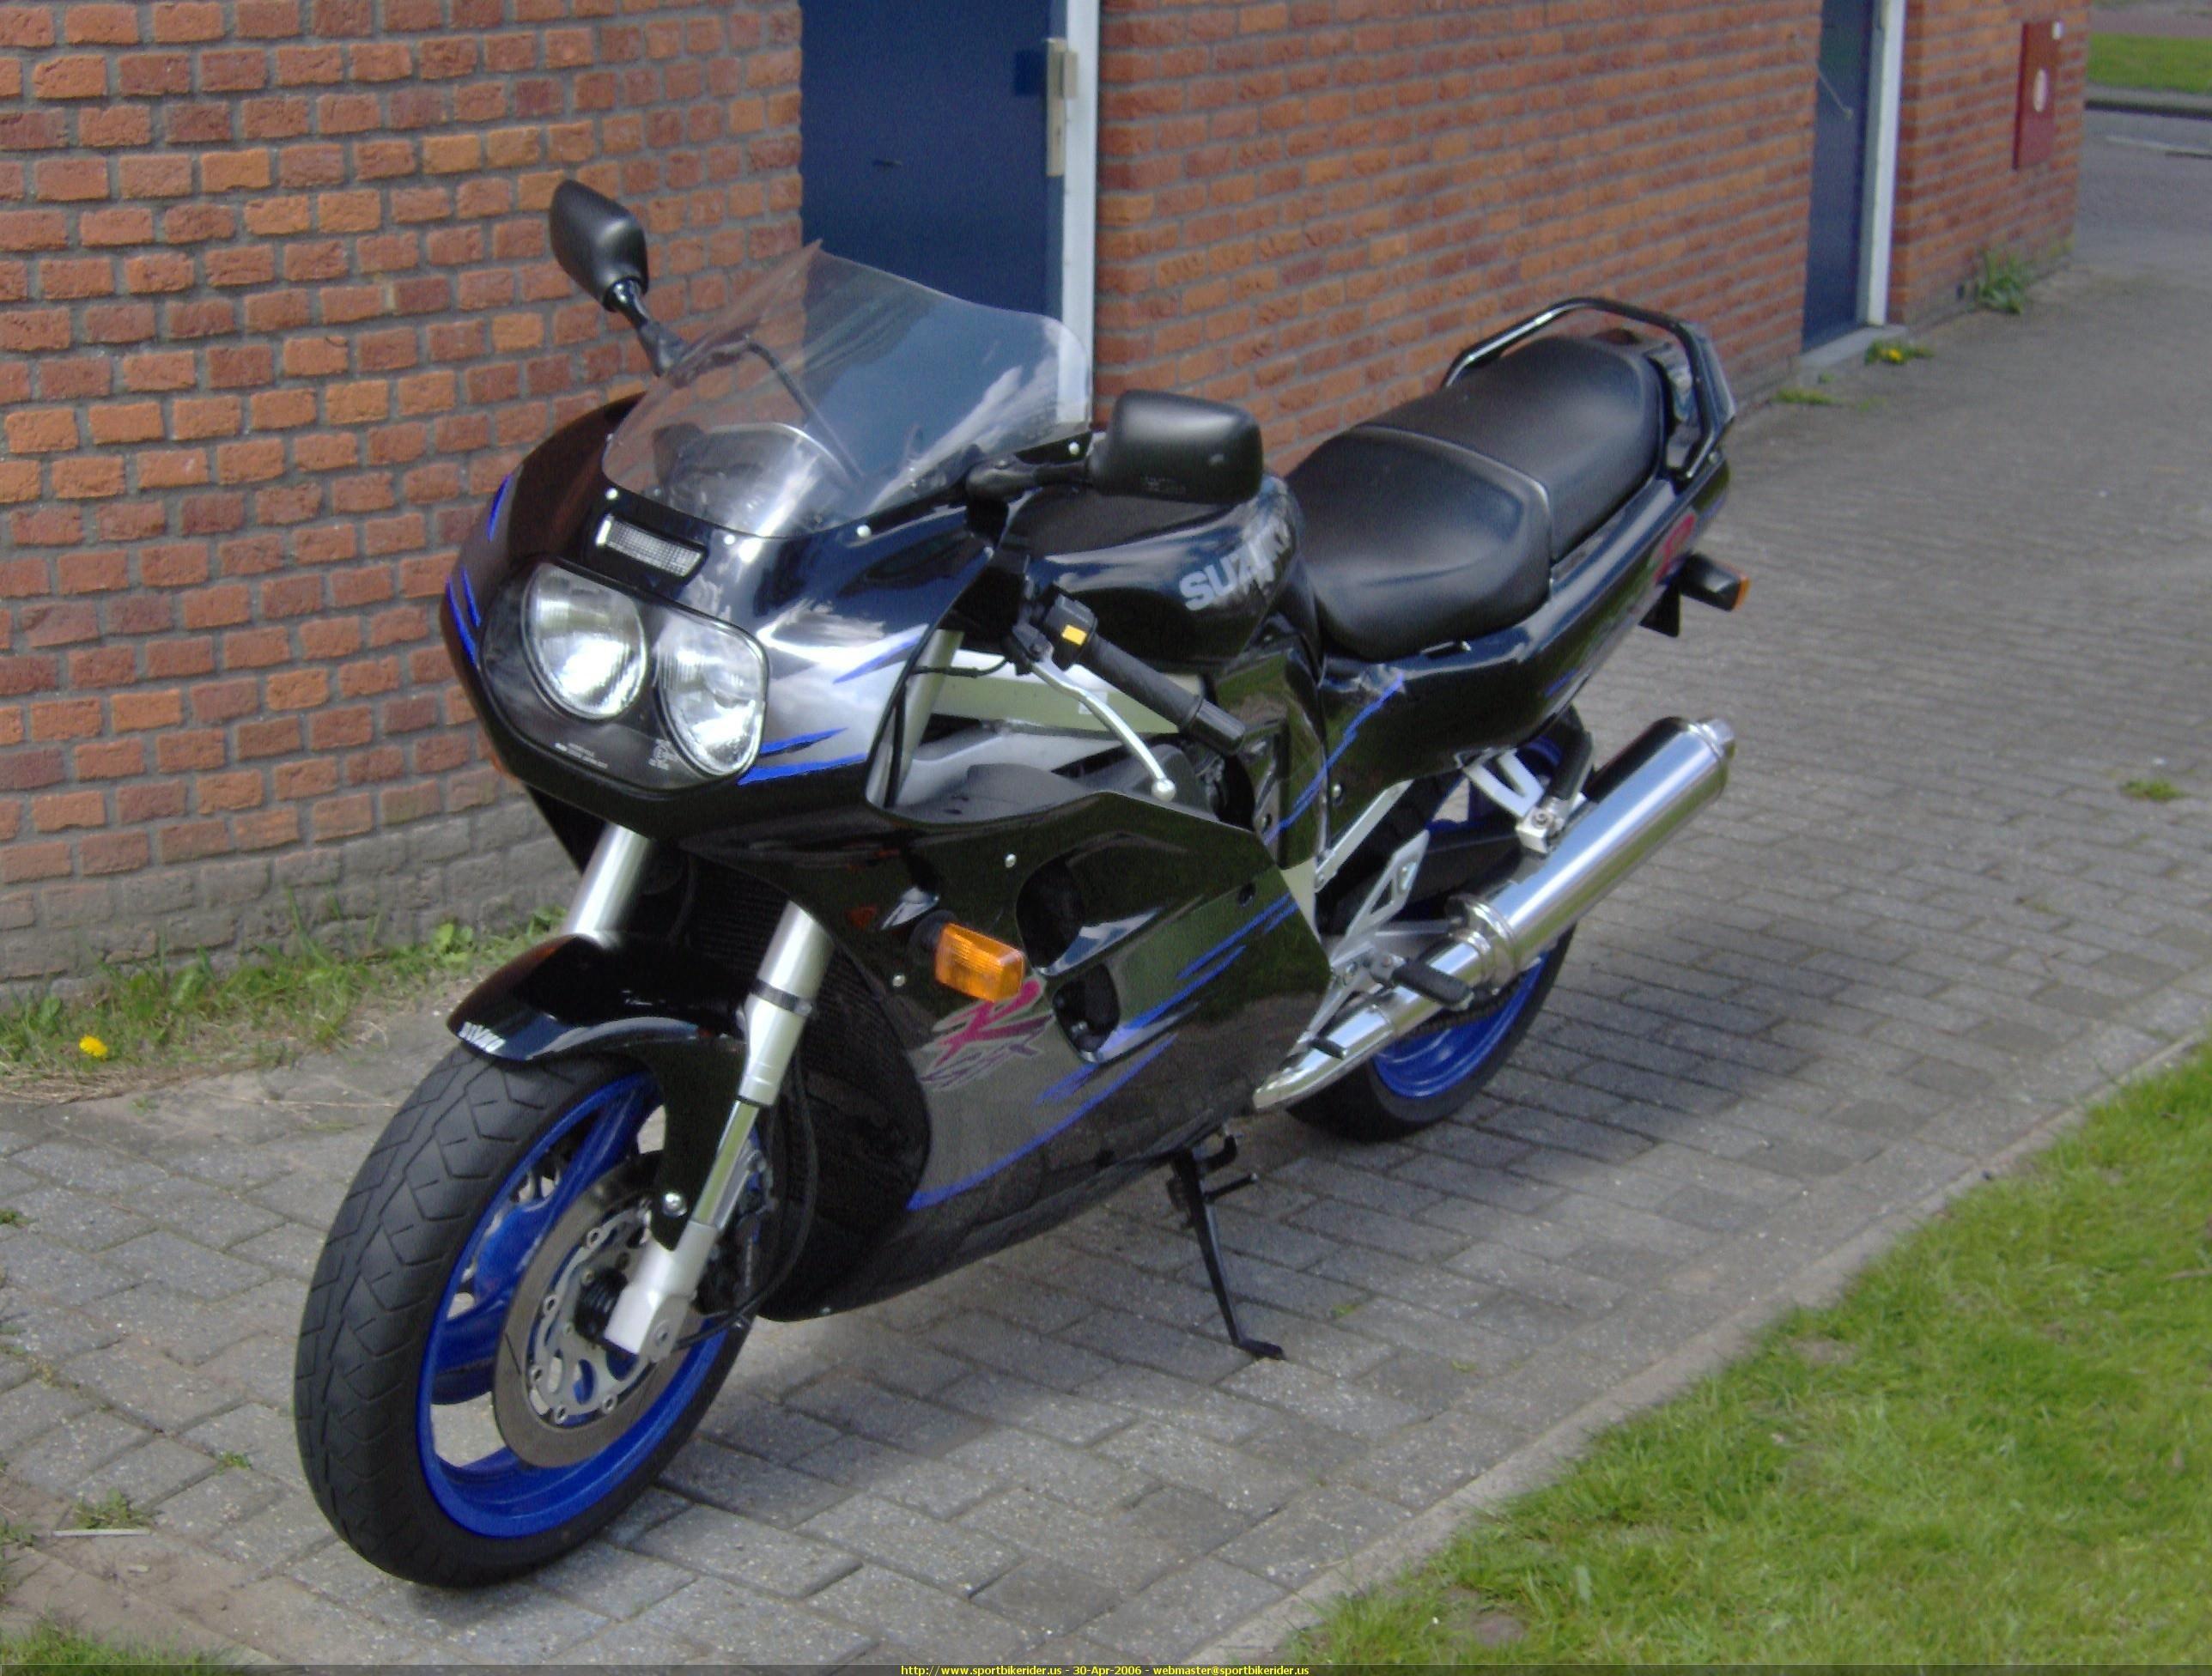 Picture Of A 2005 Ducati 999 Sportbike Id 108972 Sport Bikes Suzuki Gsxr Suzuki Motor